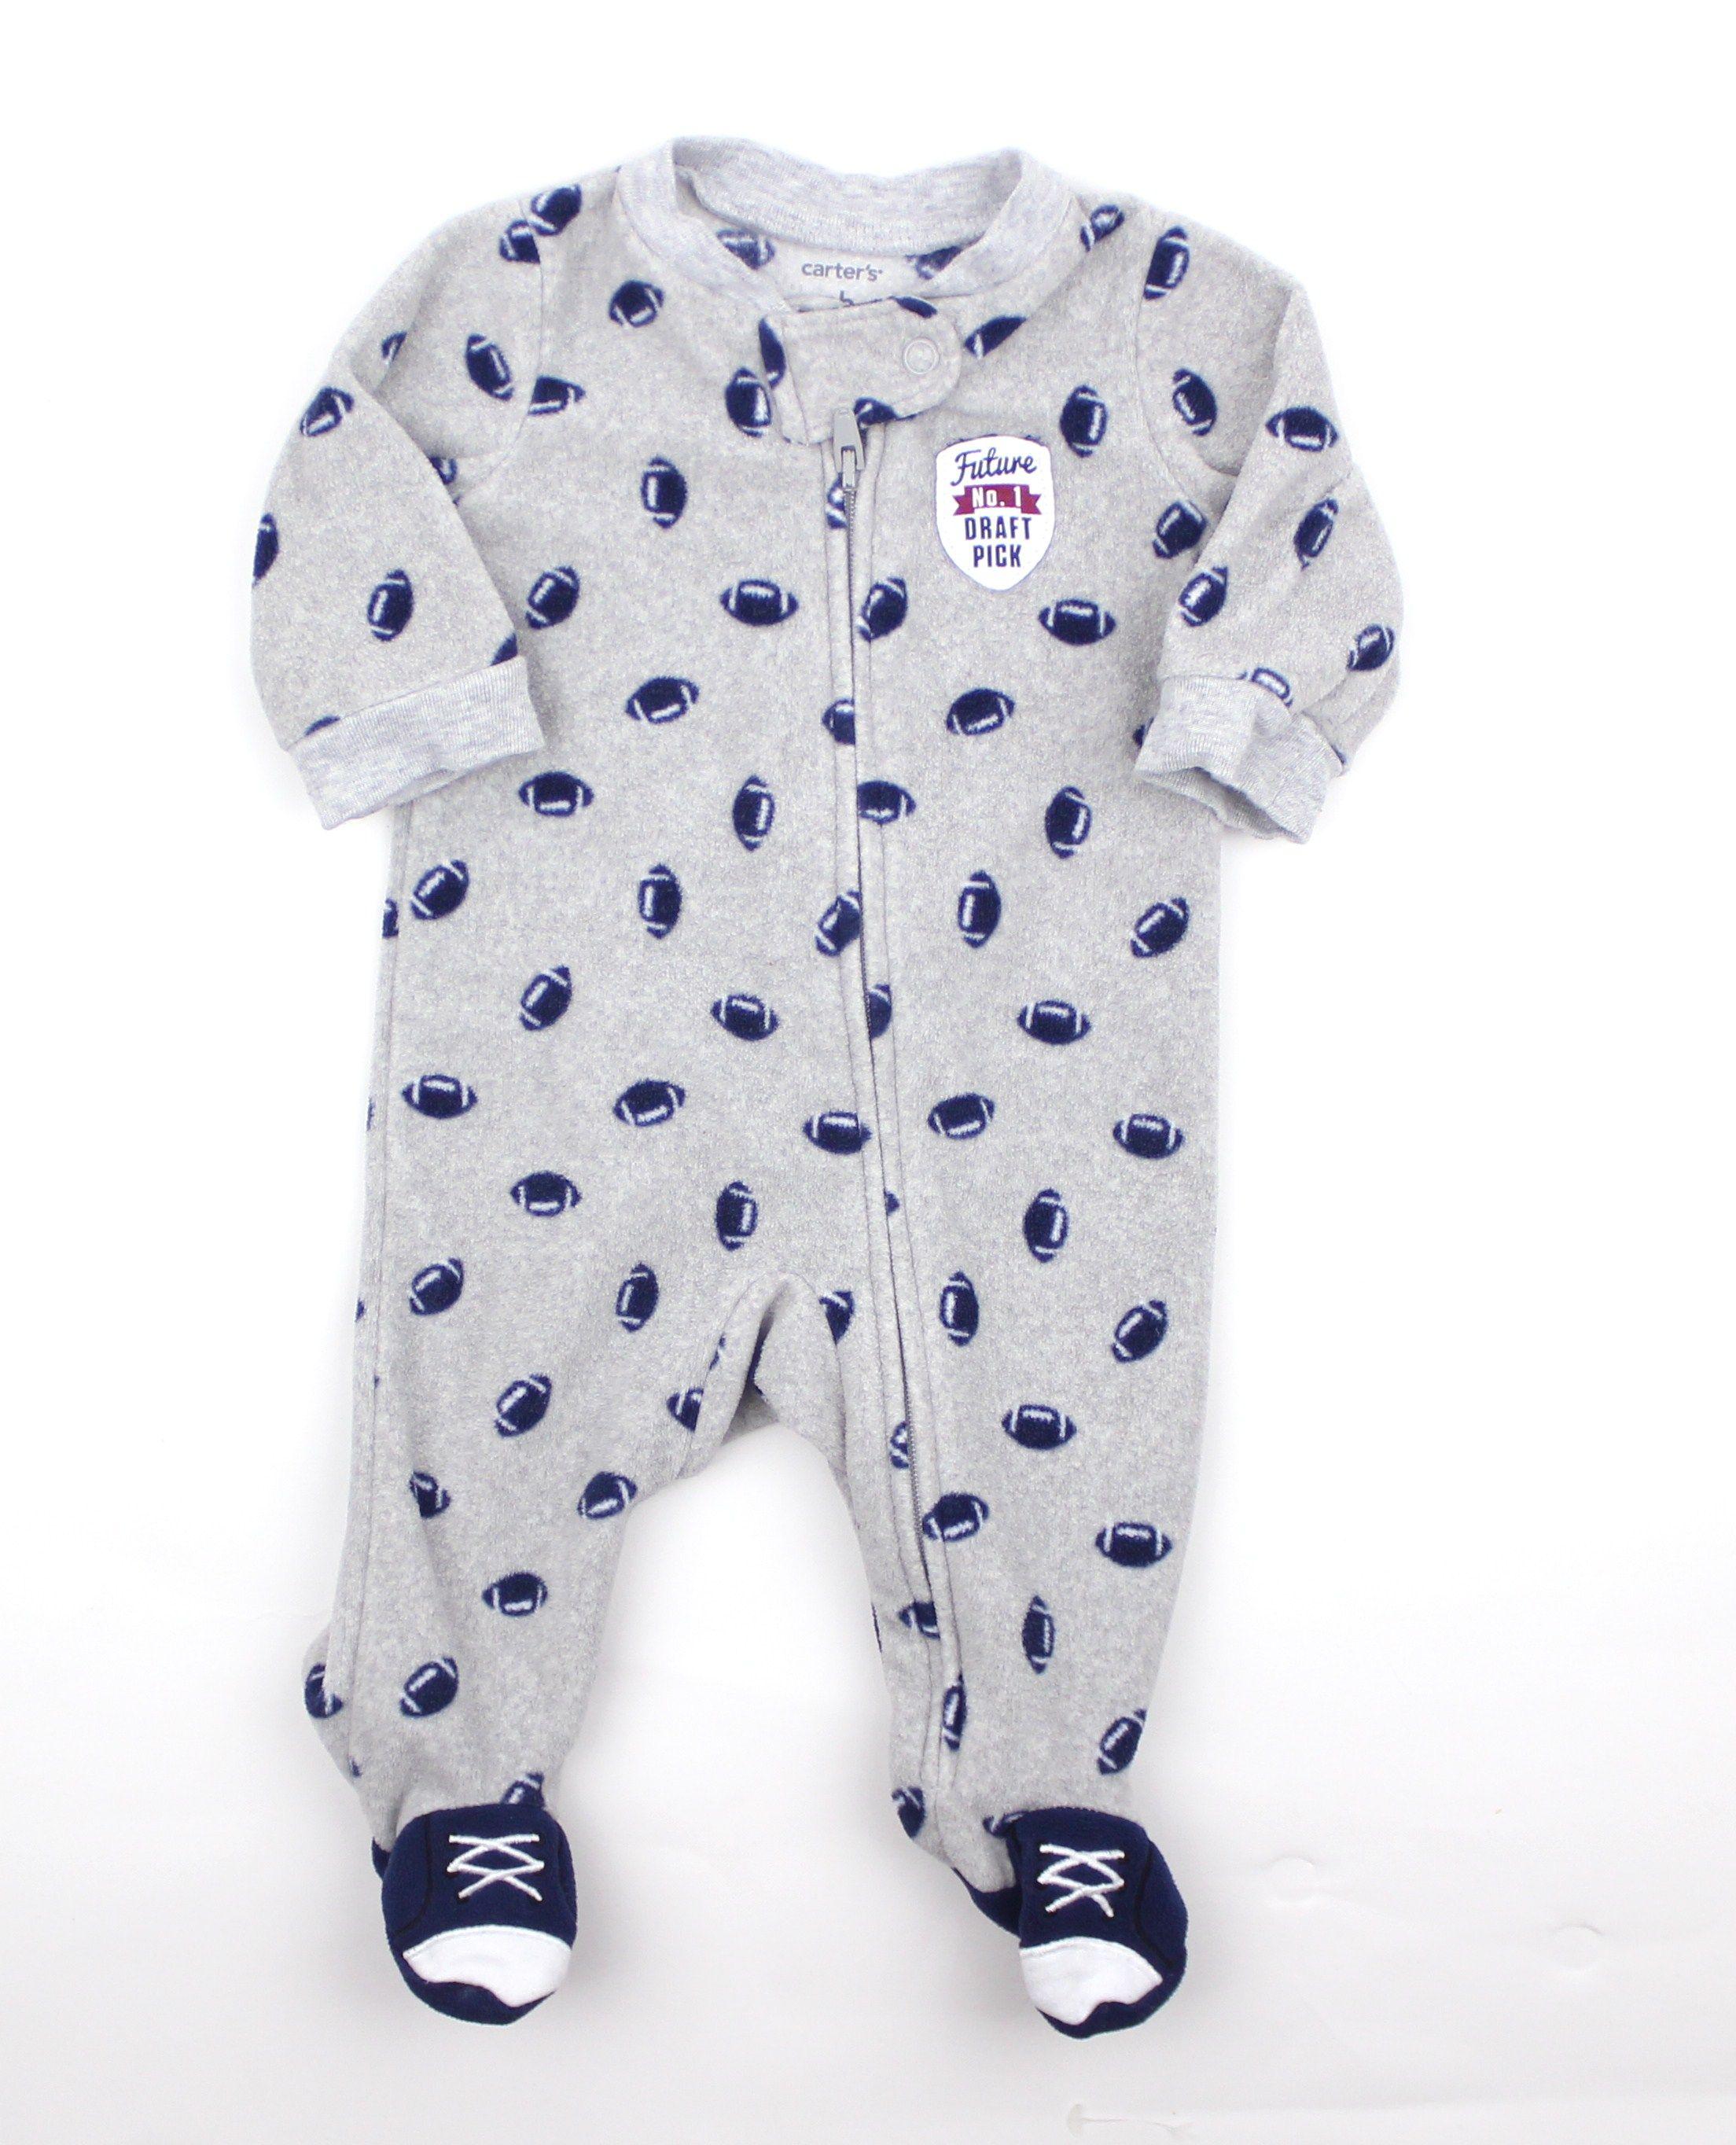 Newborn Infant Grey Fleece Sleeper with Football Motif by Carters